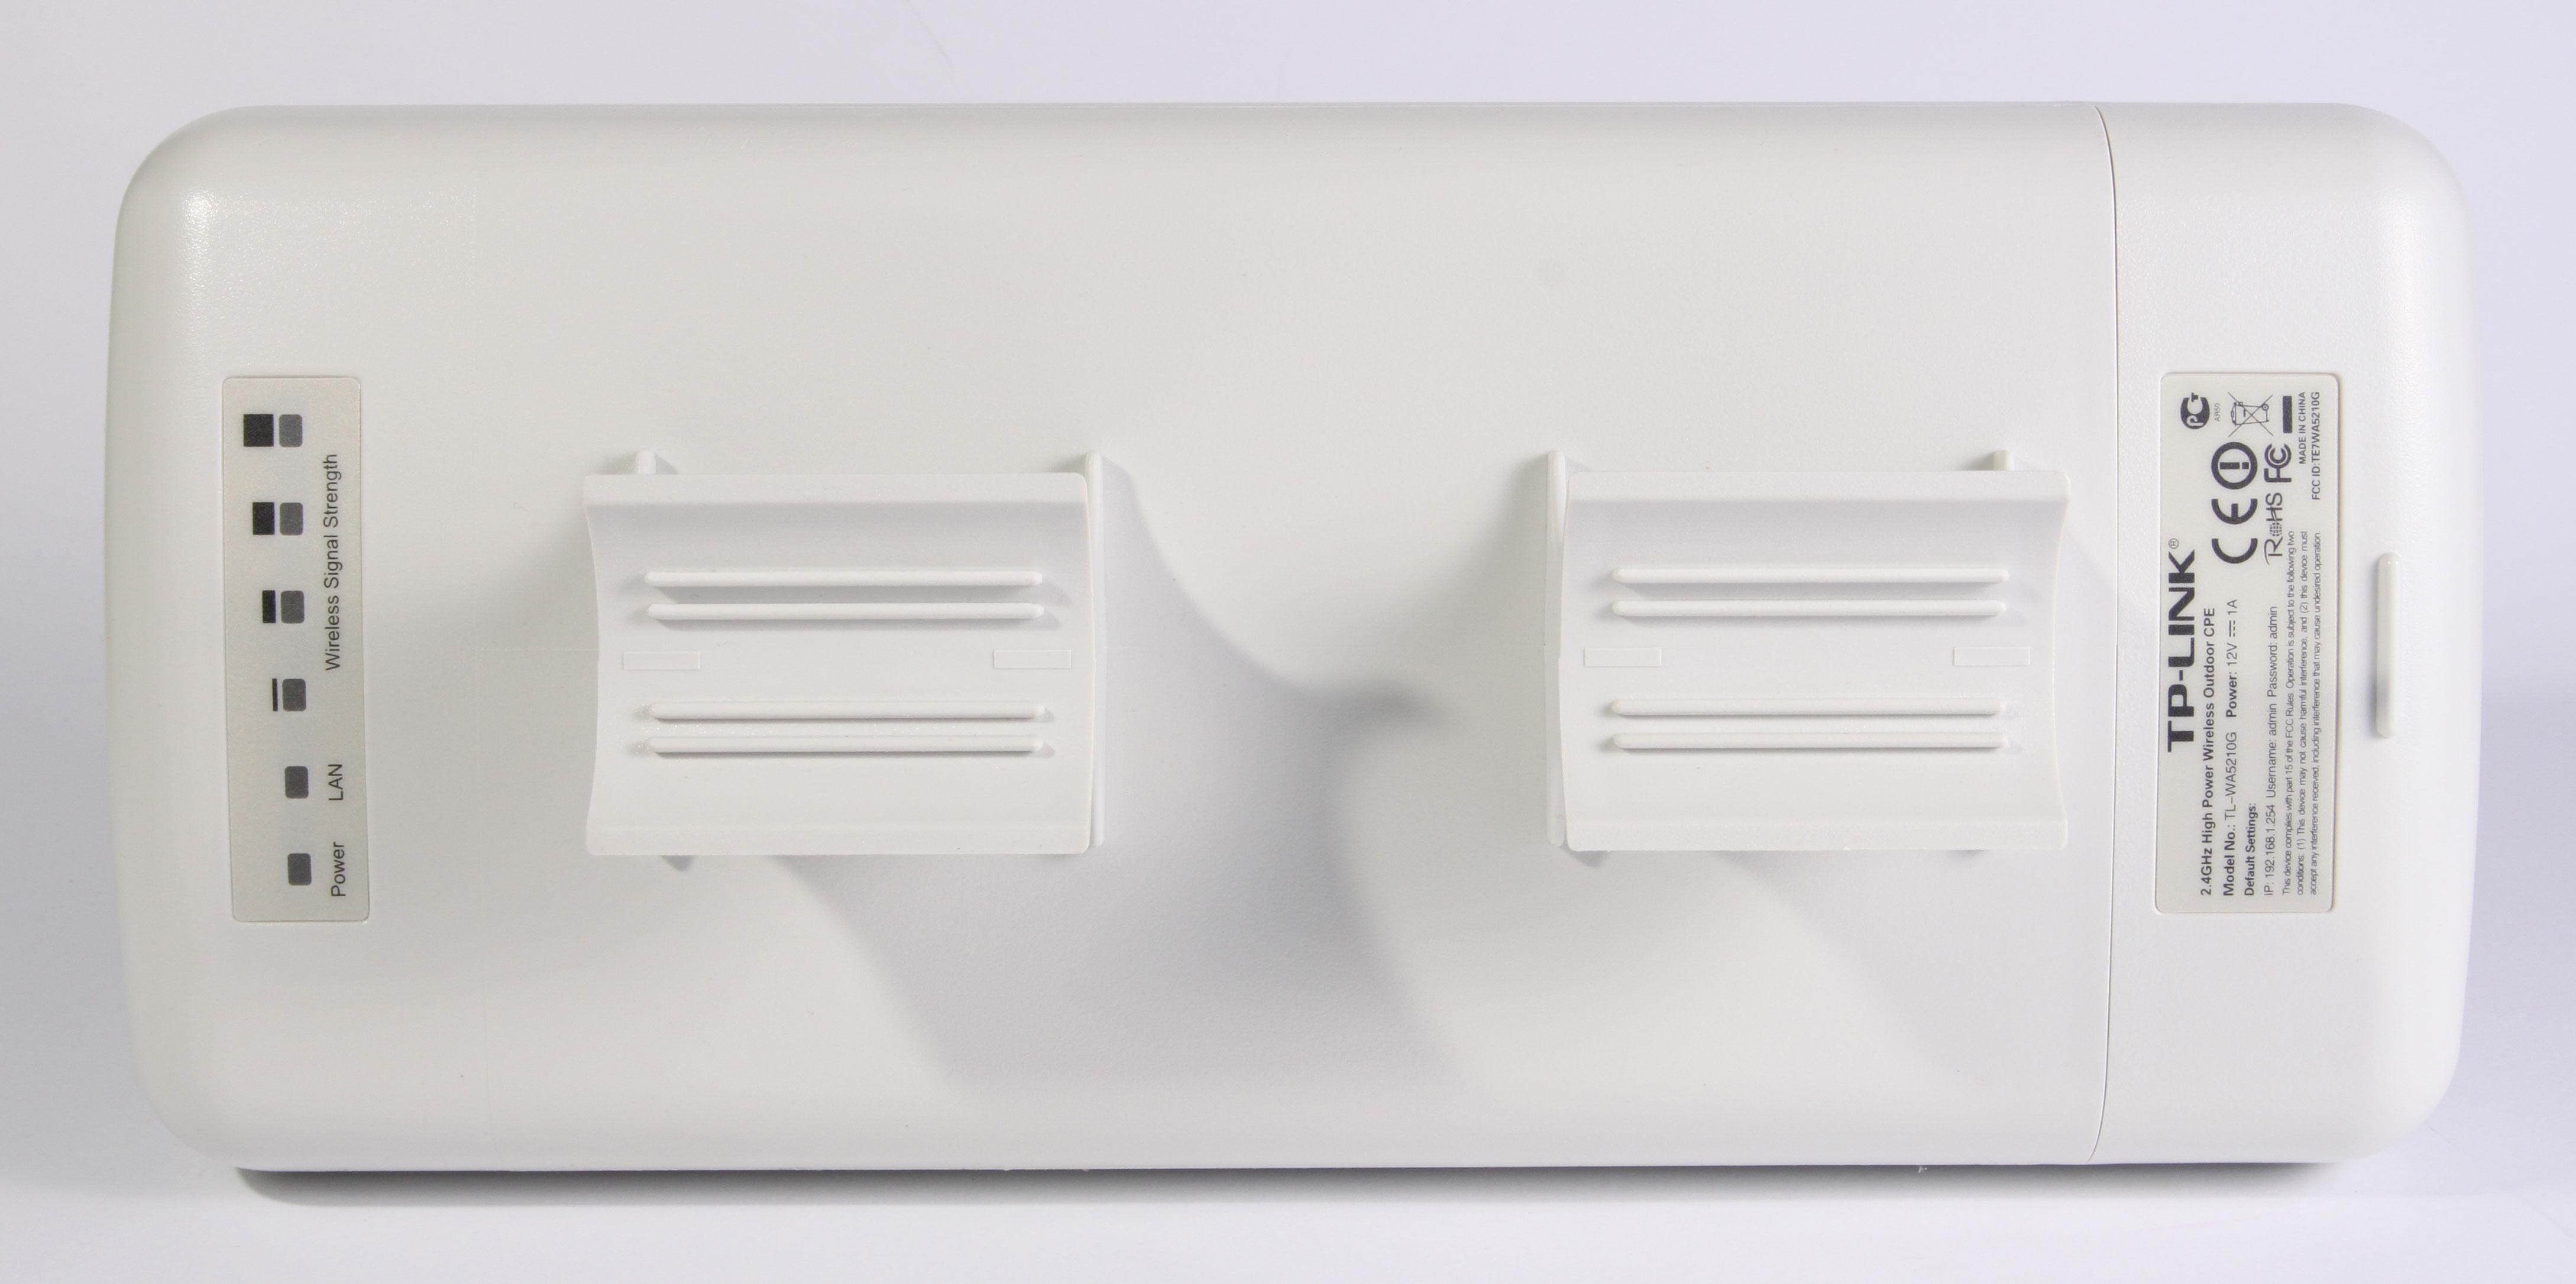 TP-Link WA5210G внешний вид